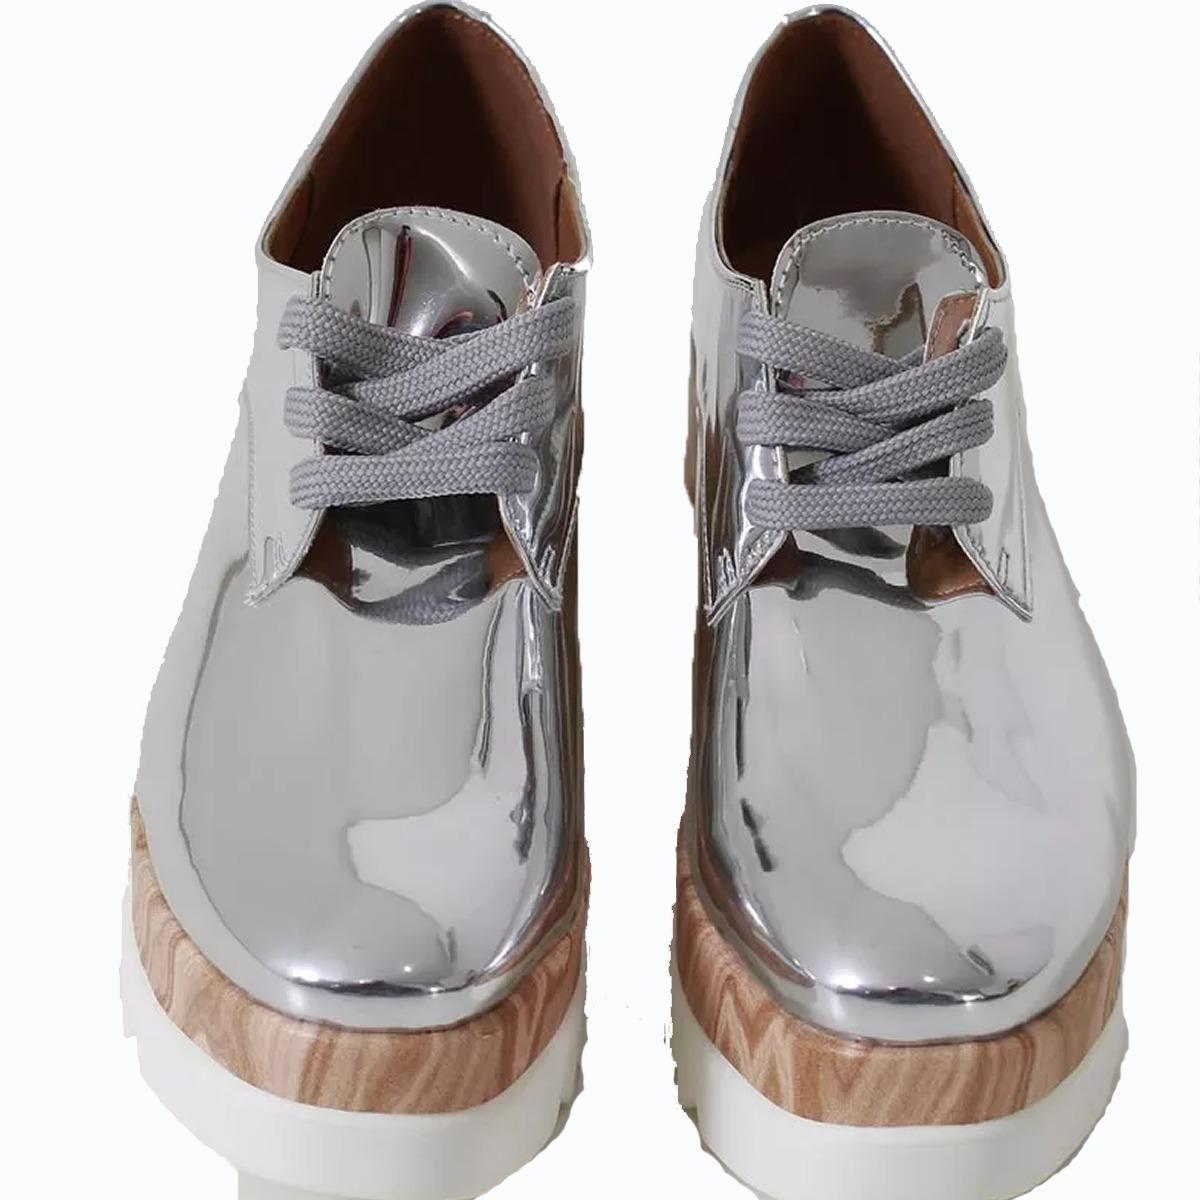 358cd880f sapato oxford feminino tratorado flatform vizzano prata. Carregando zoom.